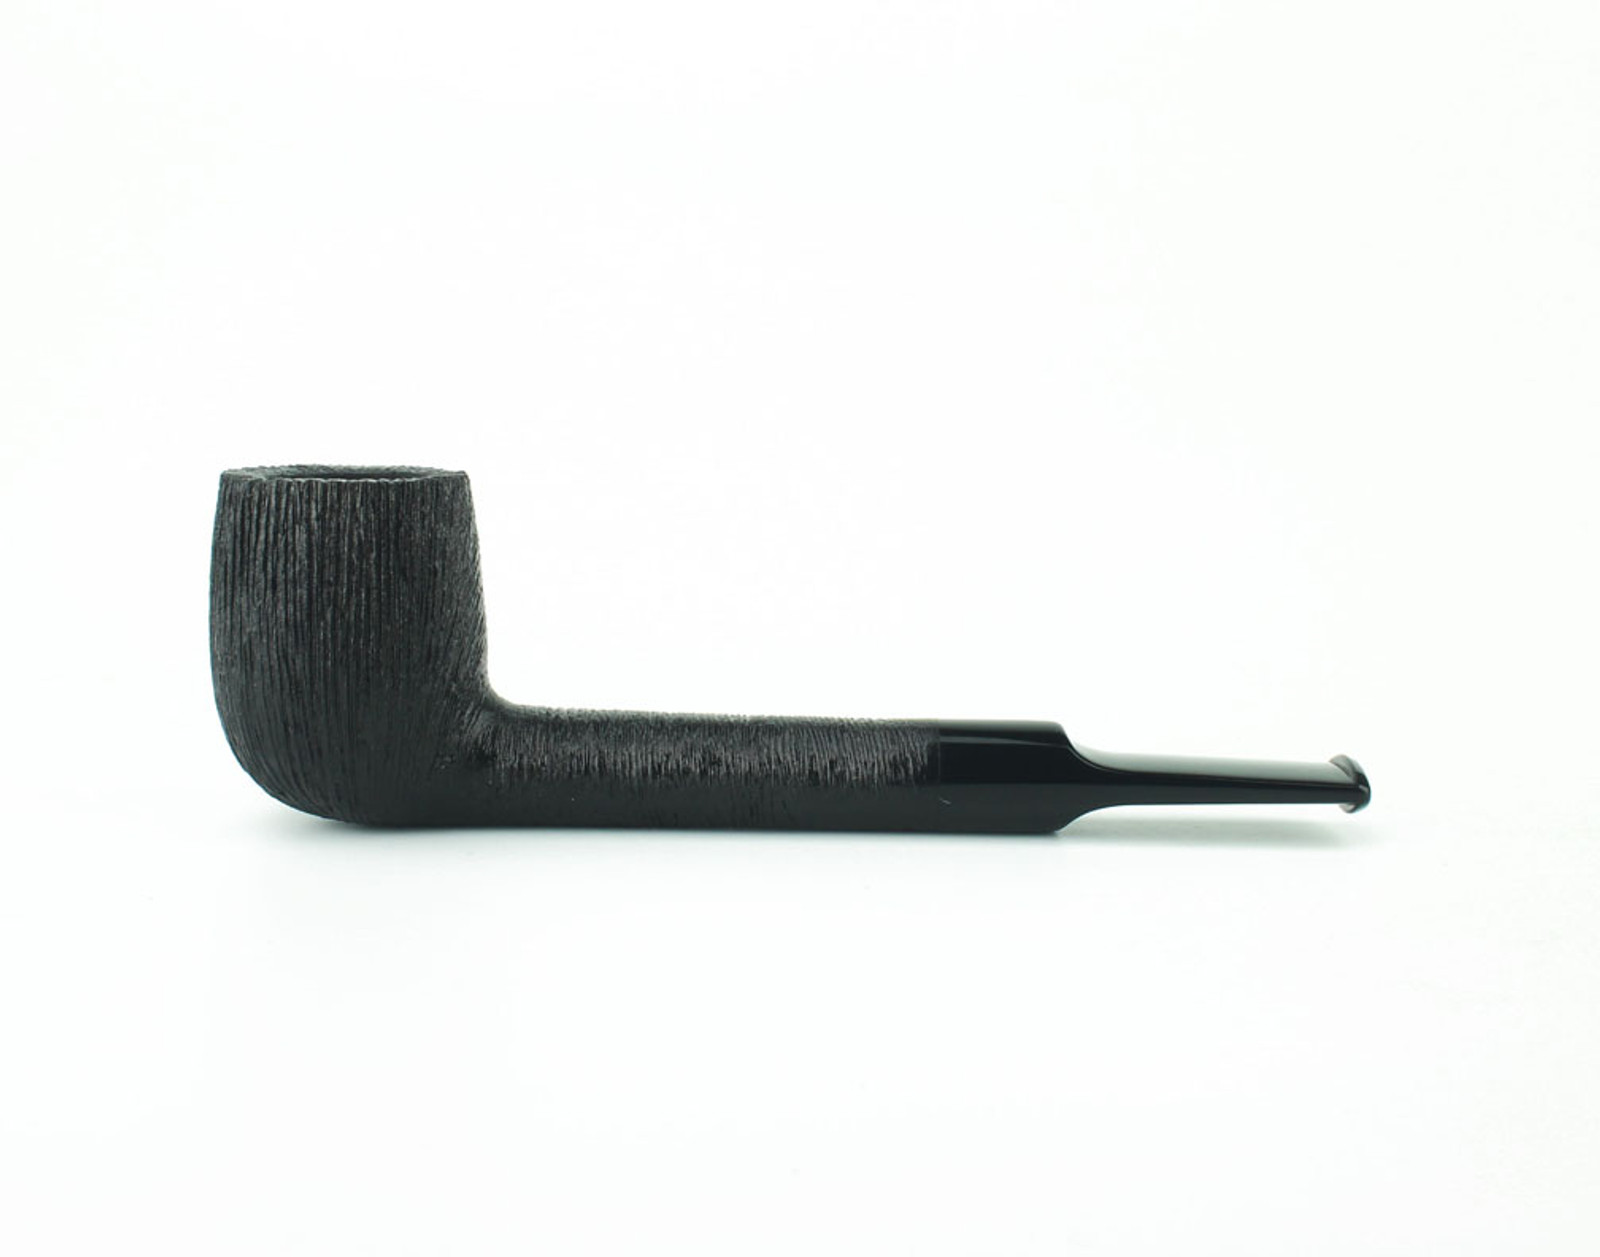 C23DR B - BriarWorks Classic C23 Lovat - Dark Rusticated w/ Black Stem